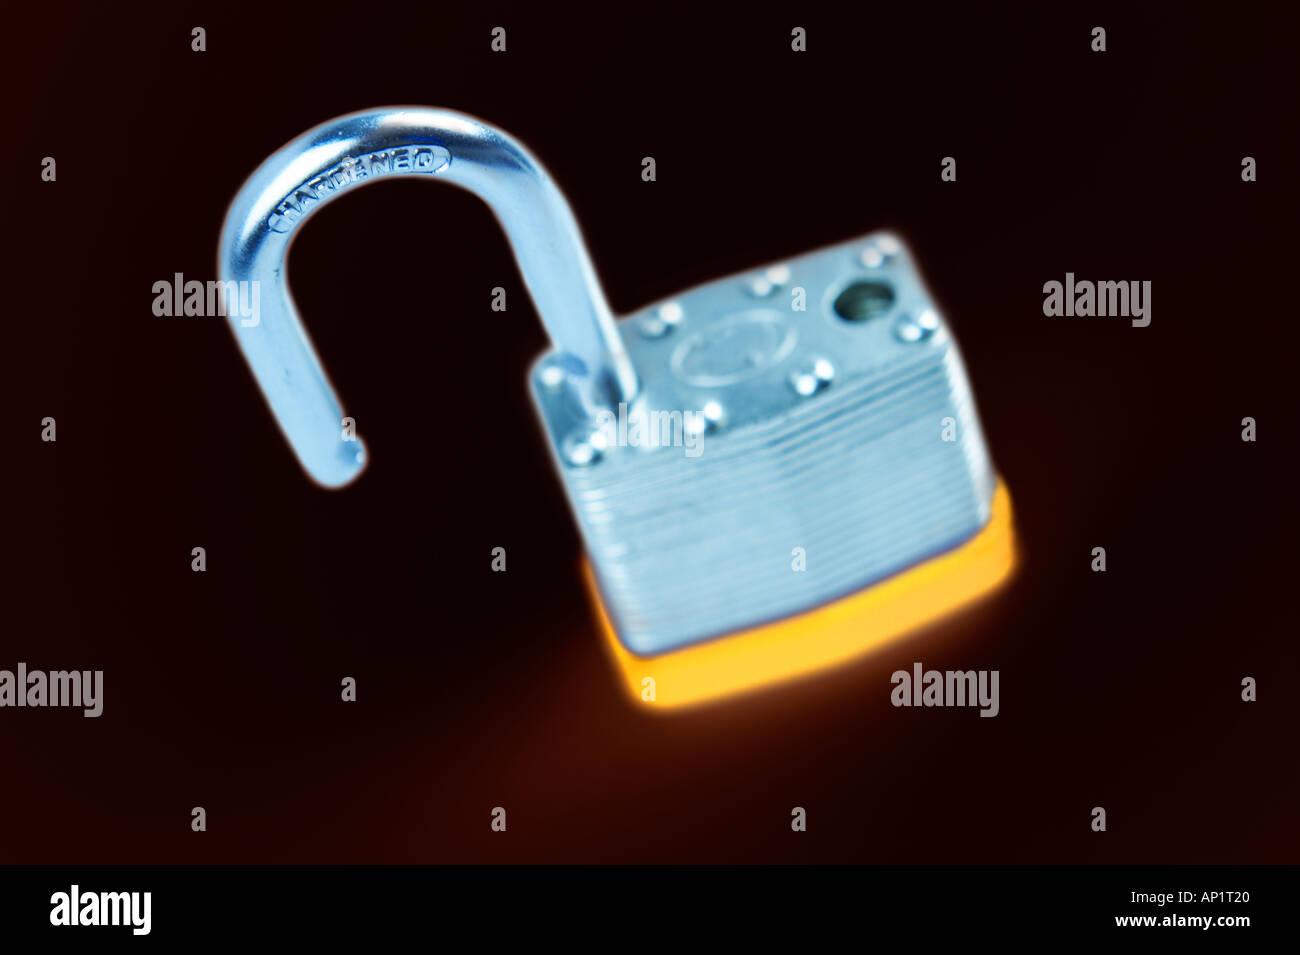 Laminated Padlock Digitally Manipulated - Stock Image